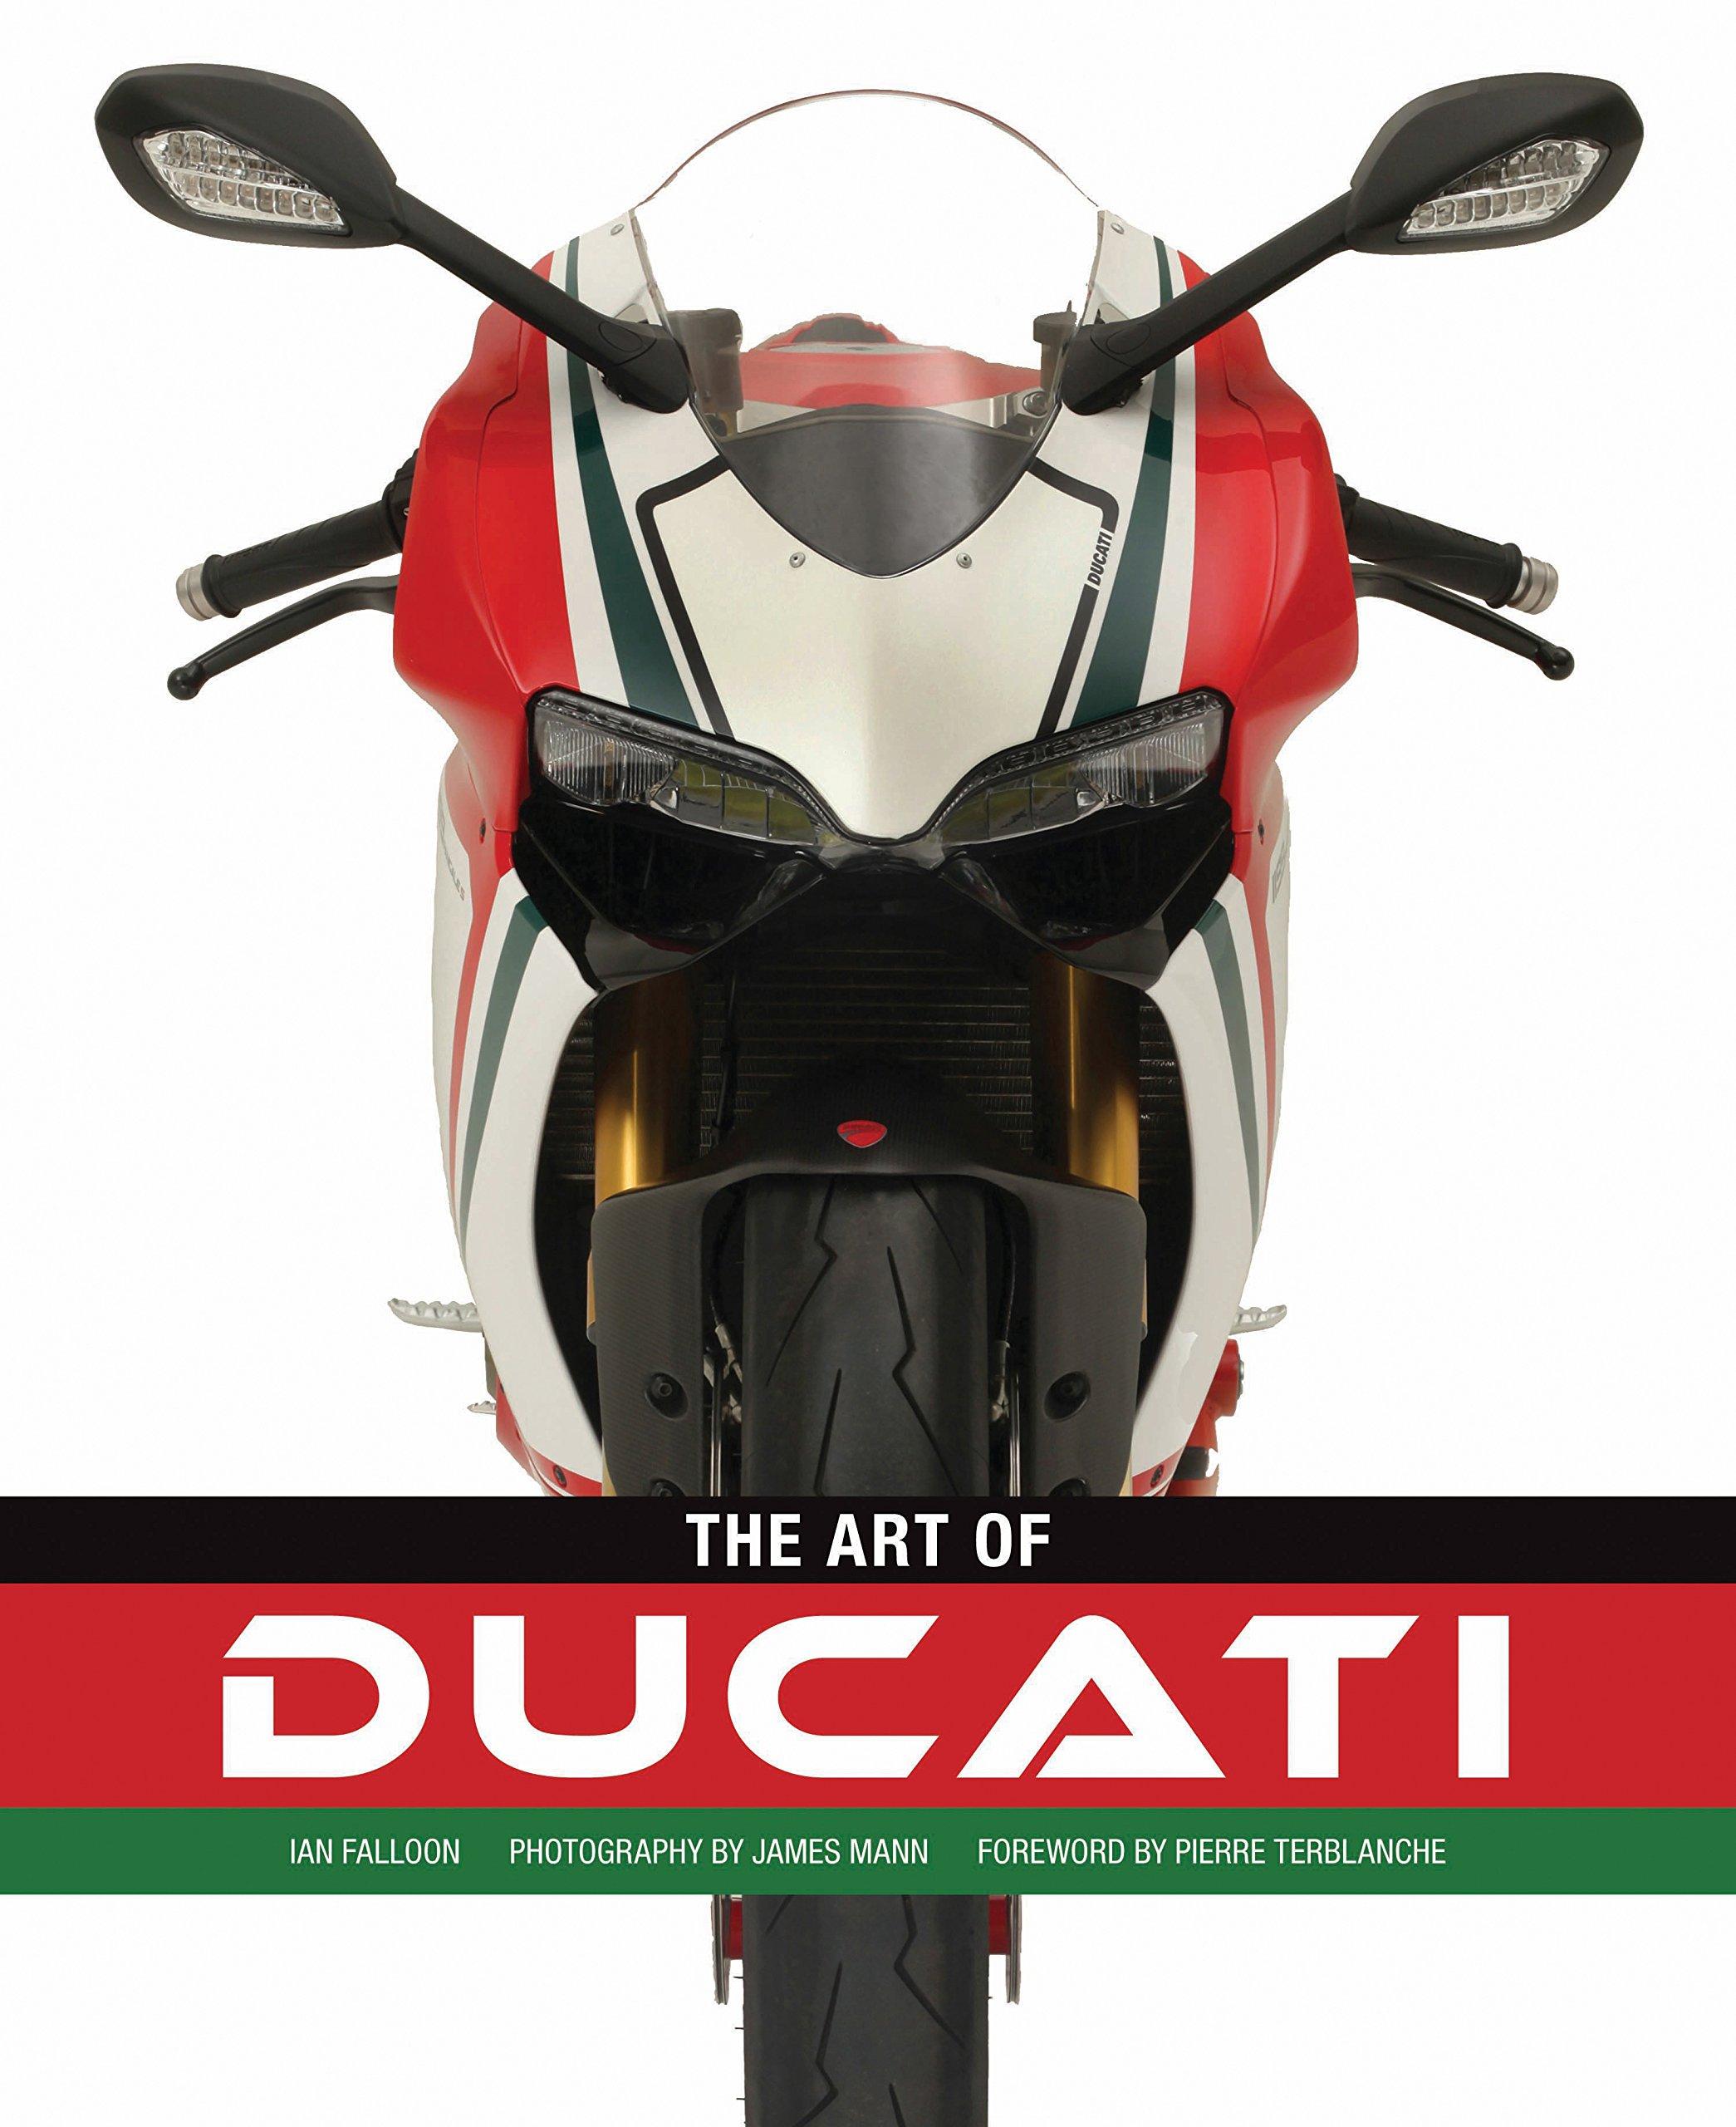 The Art Of Ducati: Ian Falloon, James Mann: 0752748345447: Amazon.com: Books